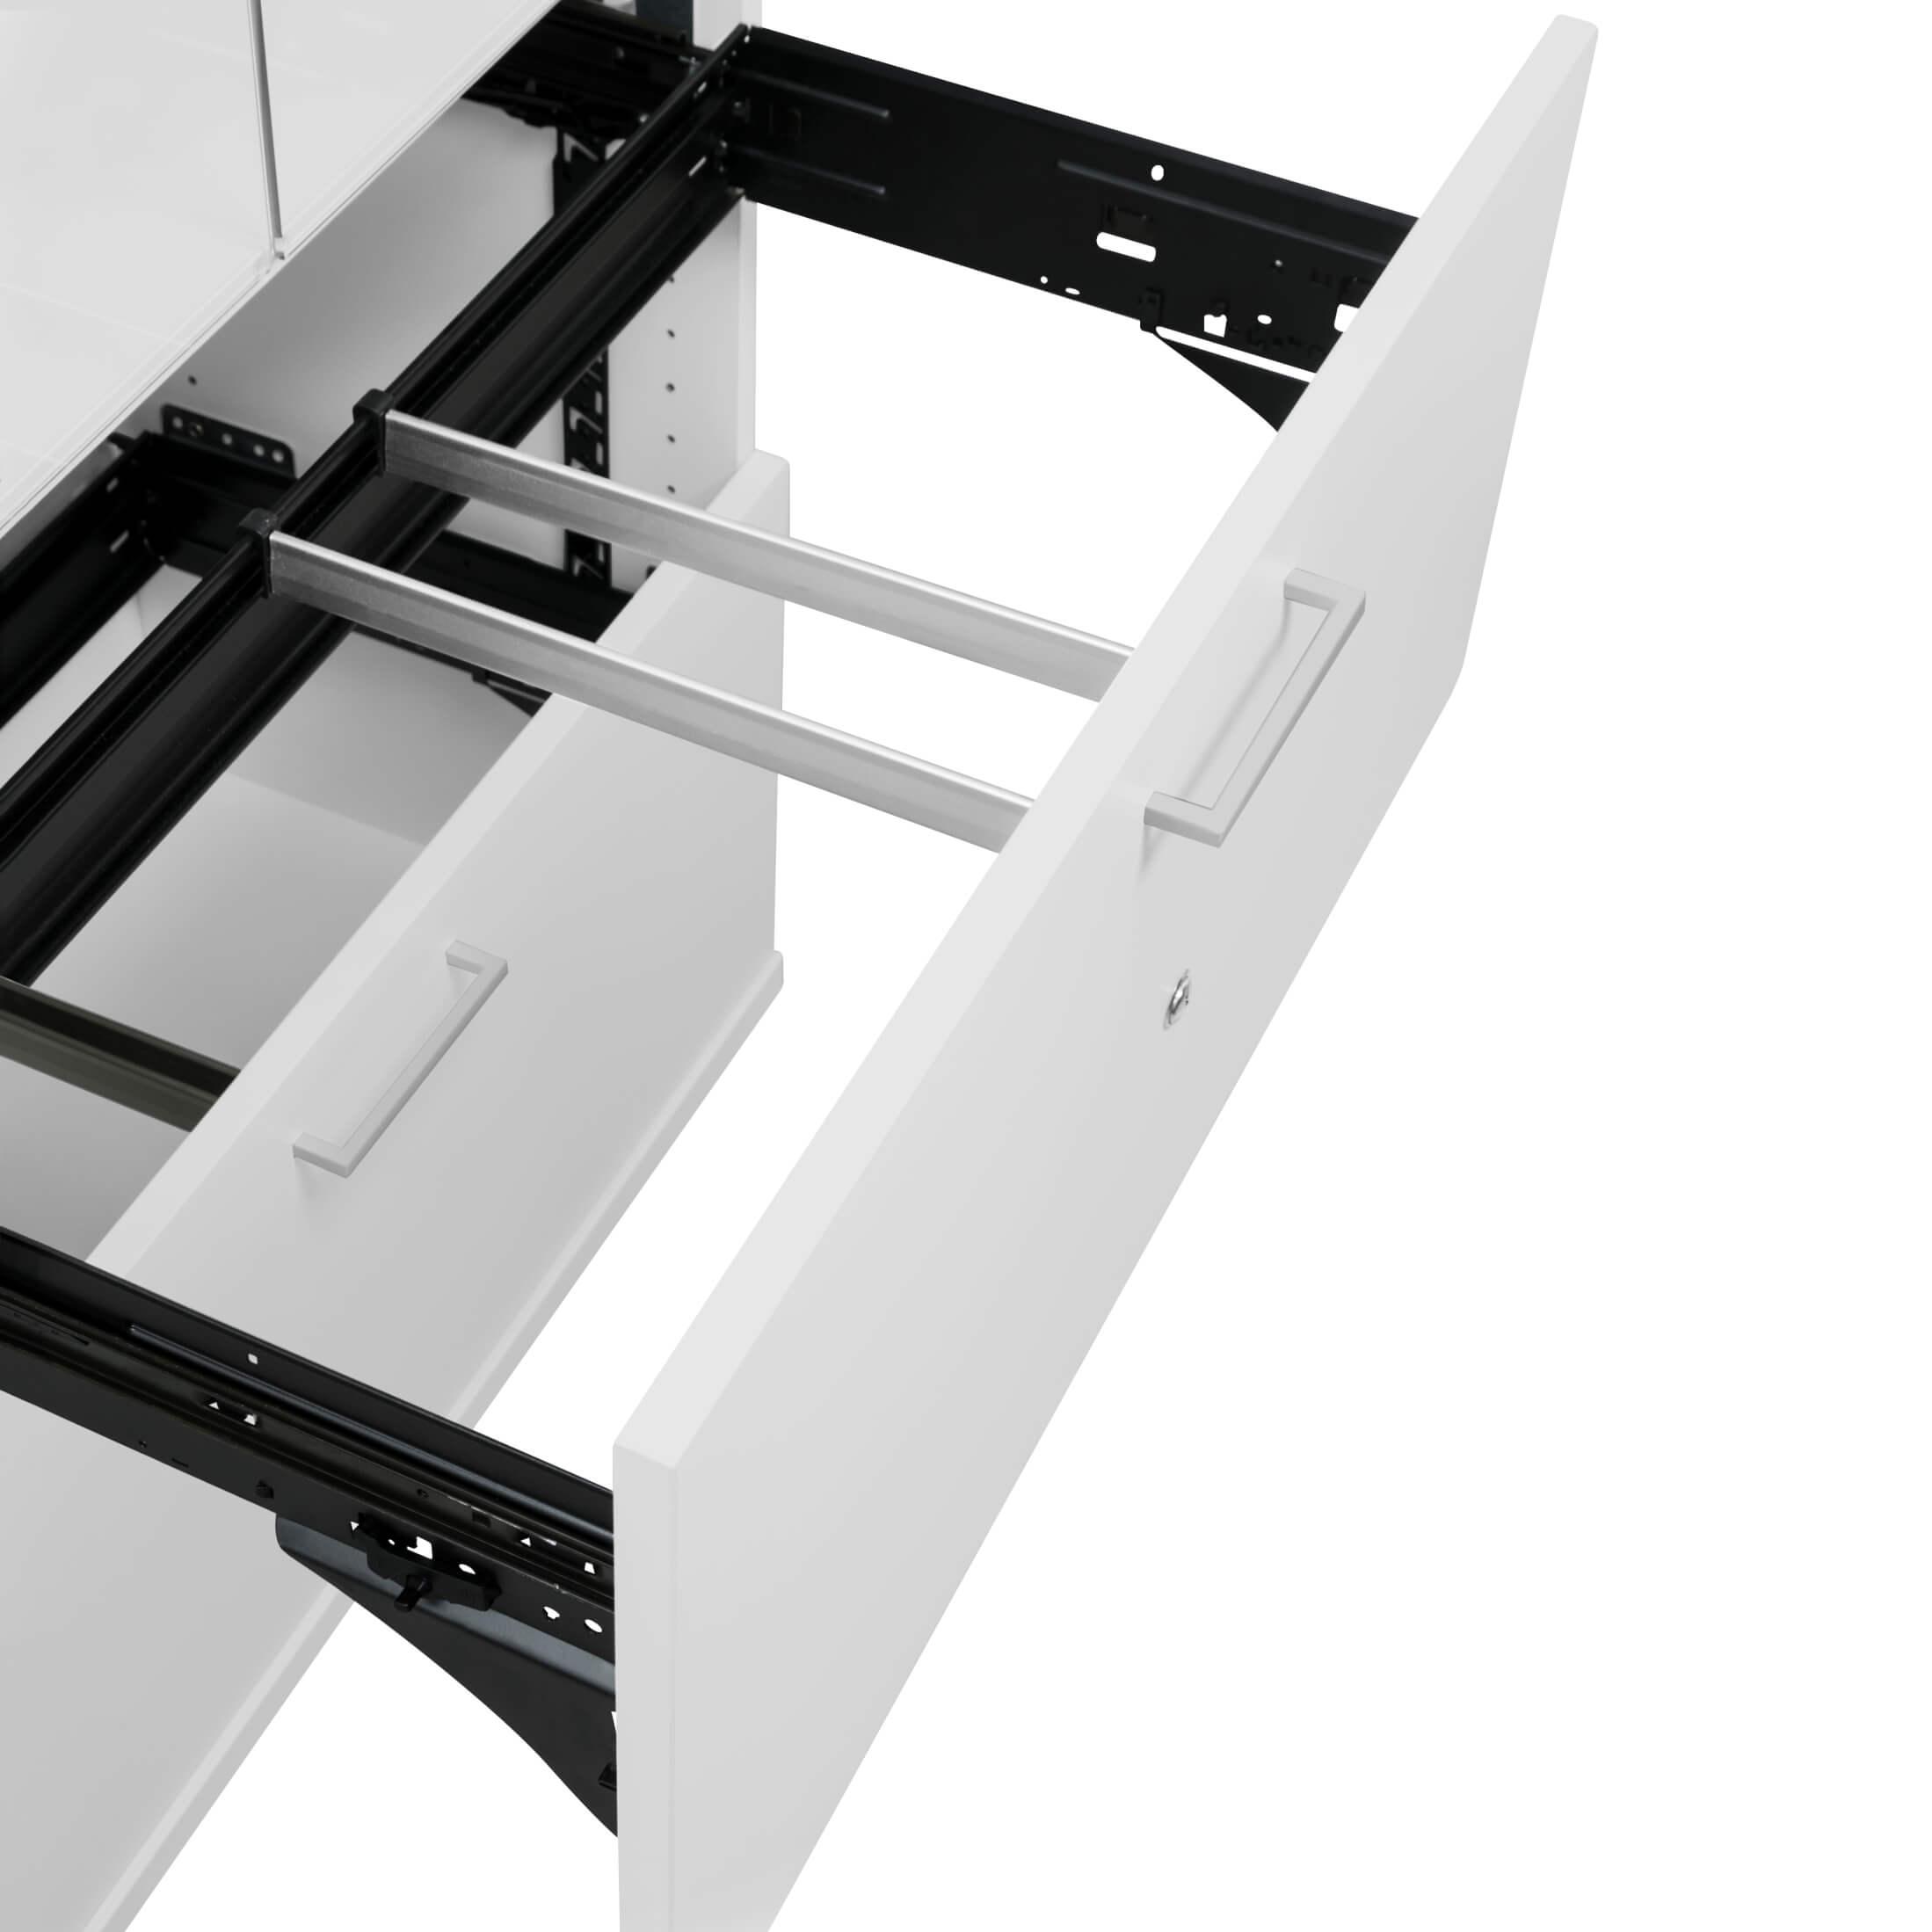 PROFI Vitrinenschrank mit Hängeregister abschließbar 5 OH Lichtgrau Schrank Büroschrank